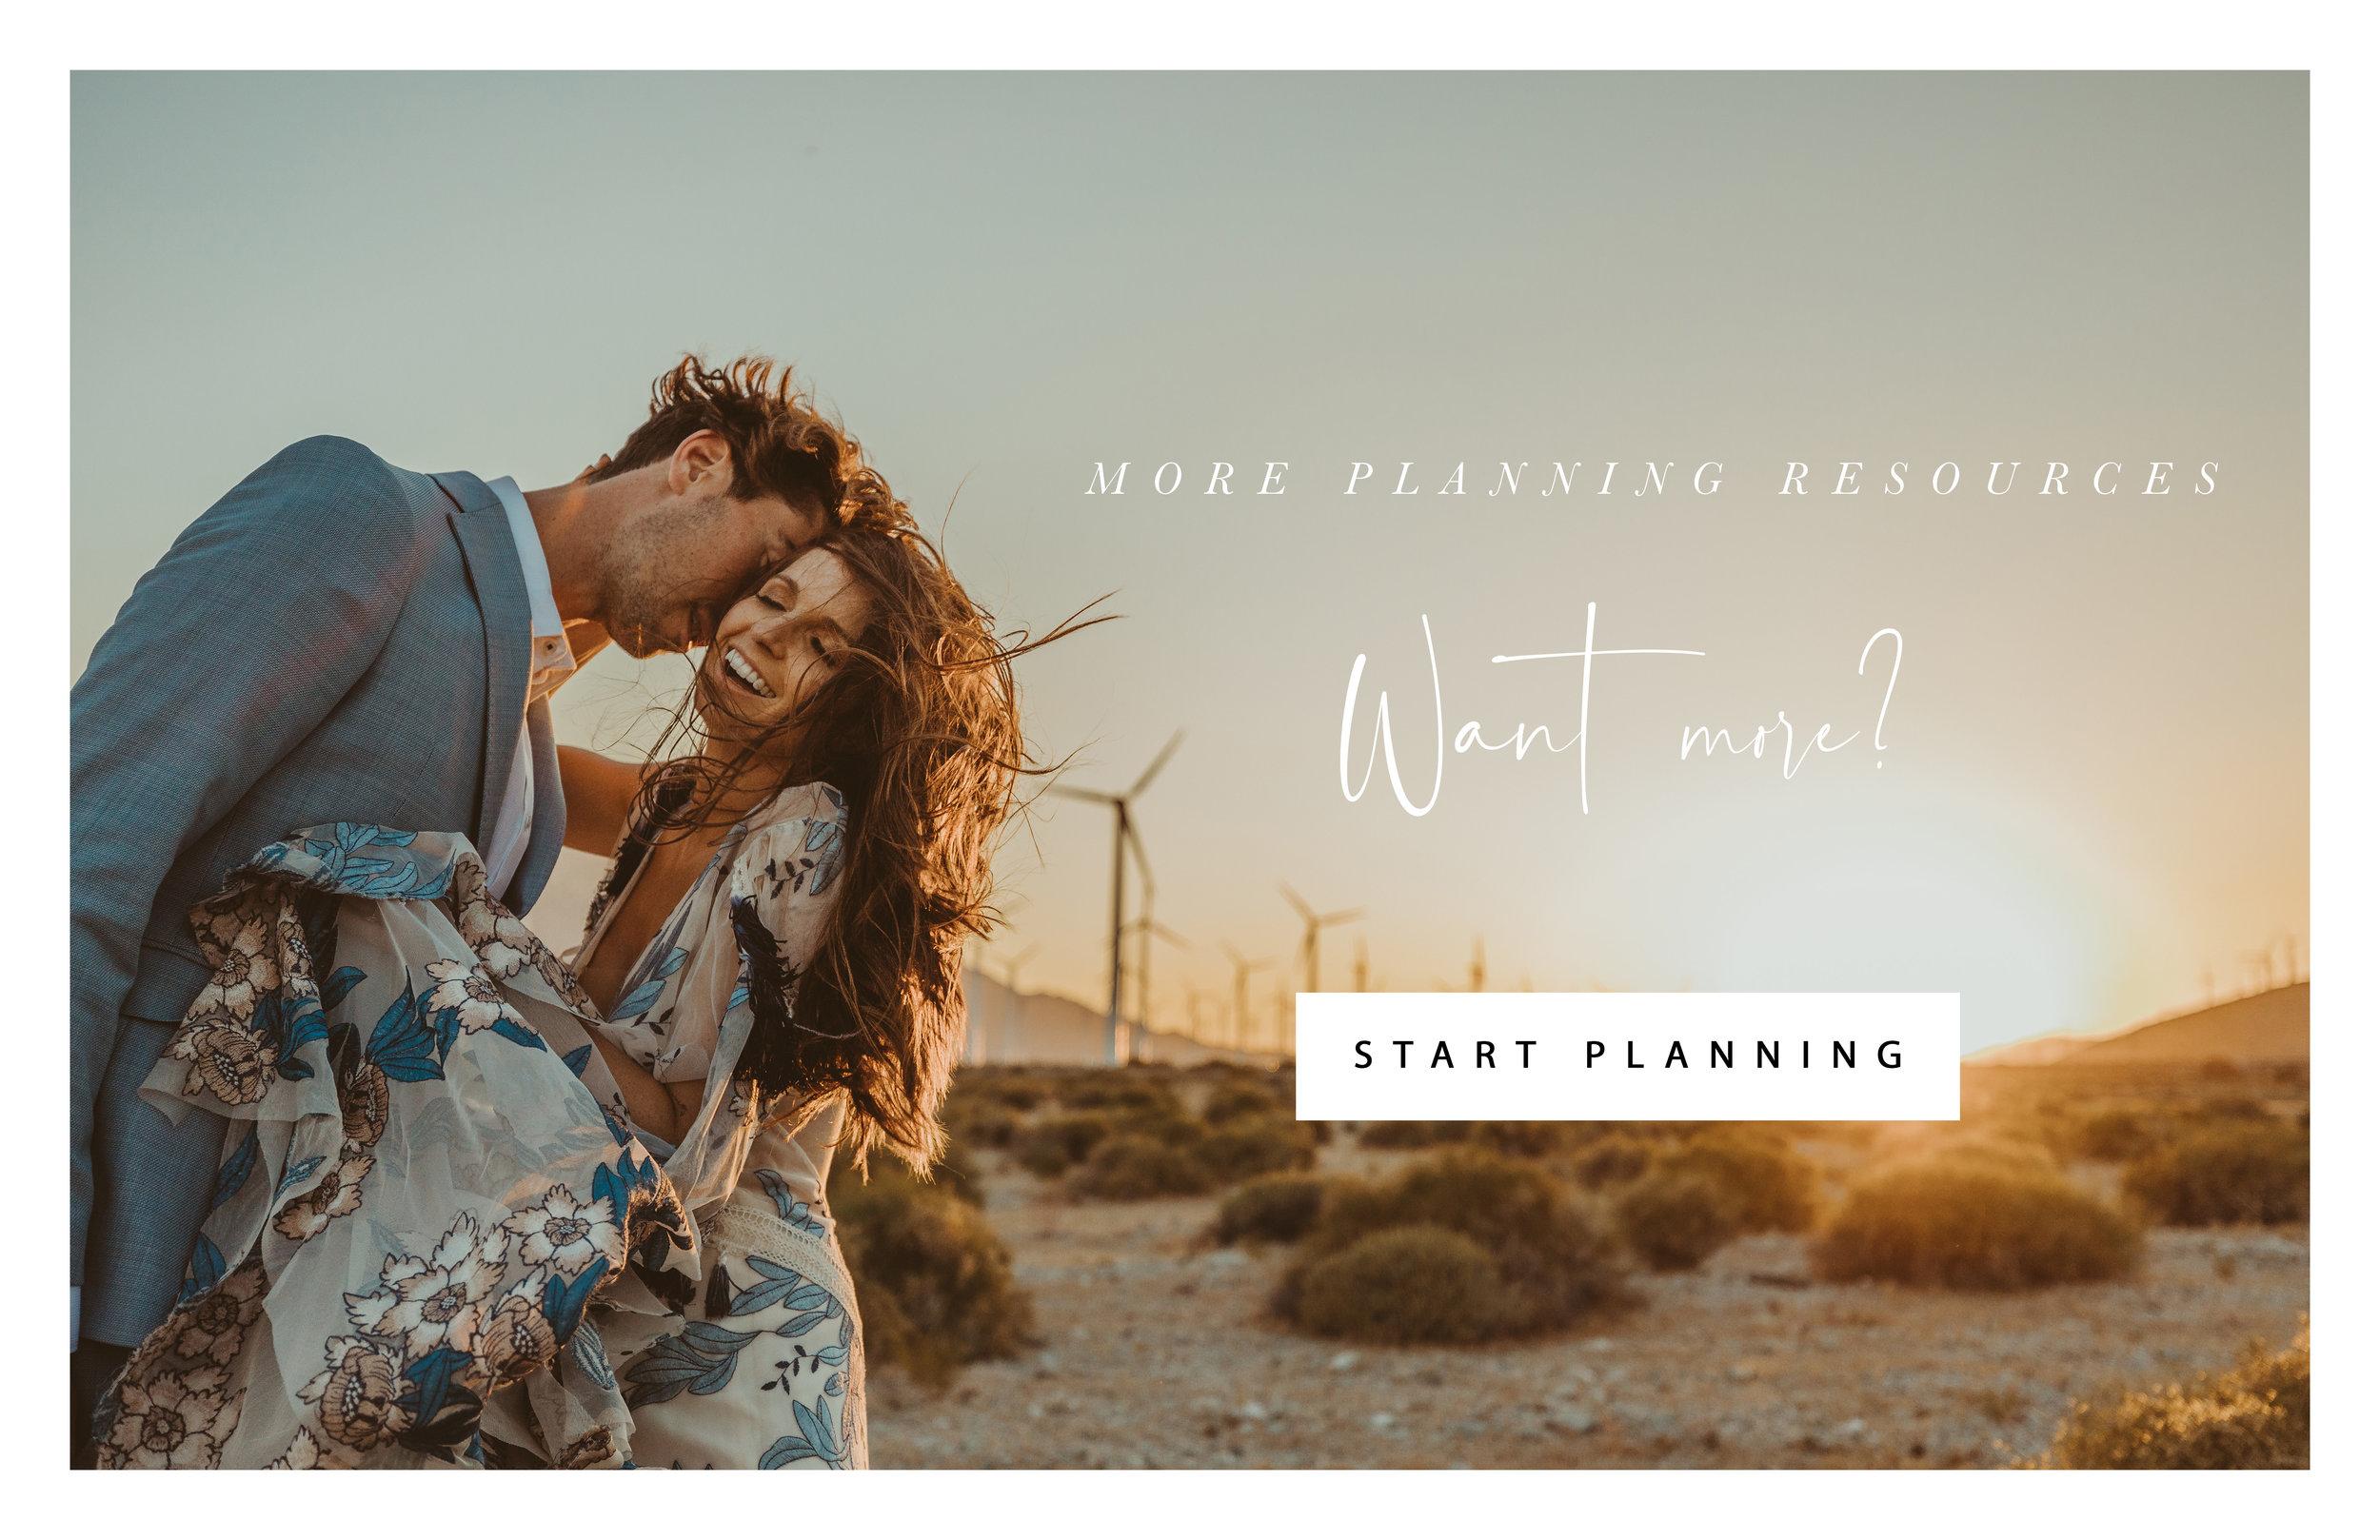 START PLANNING YOUR DREAM WEDDING OR ELOPEMENT